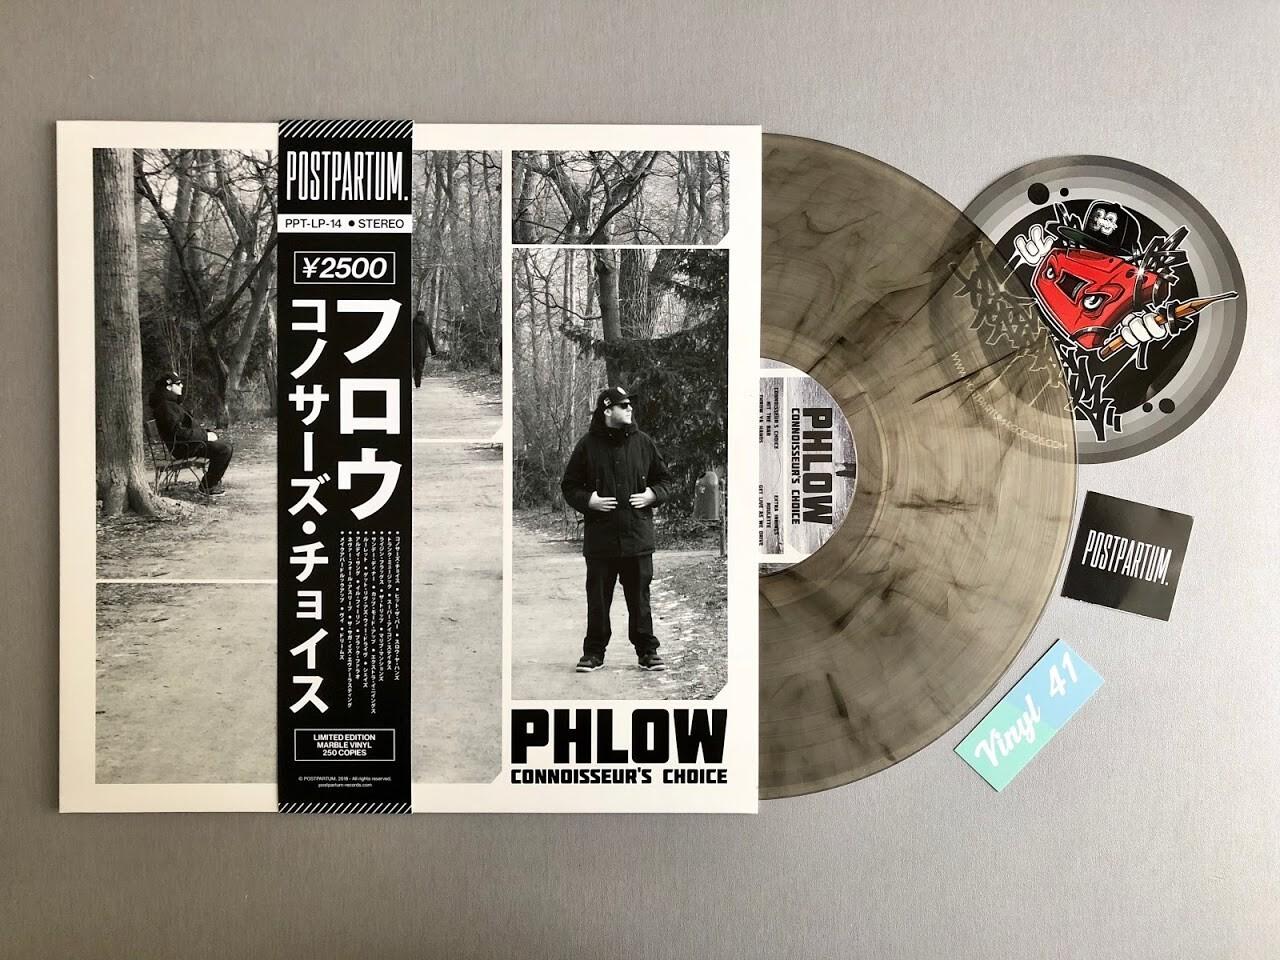 Phlow - Connoisseur's Choice